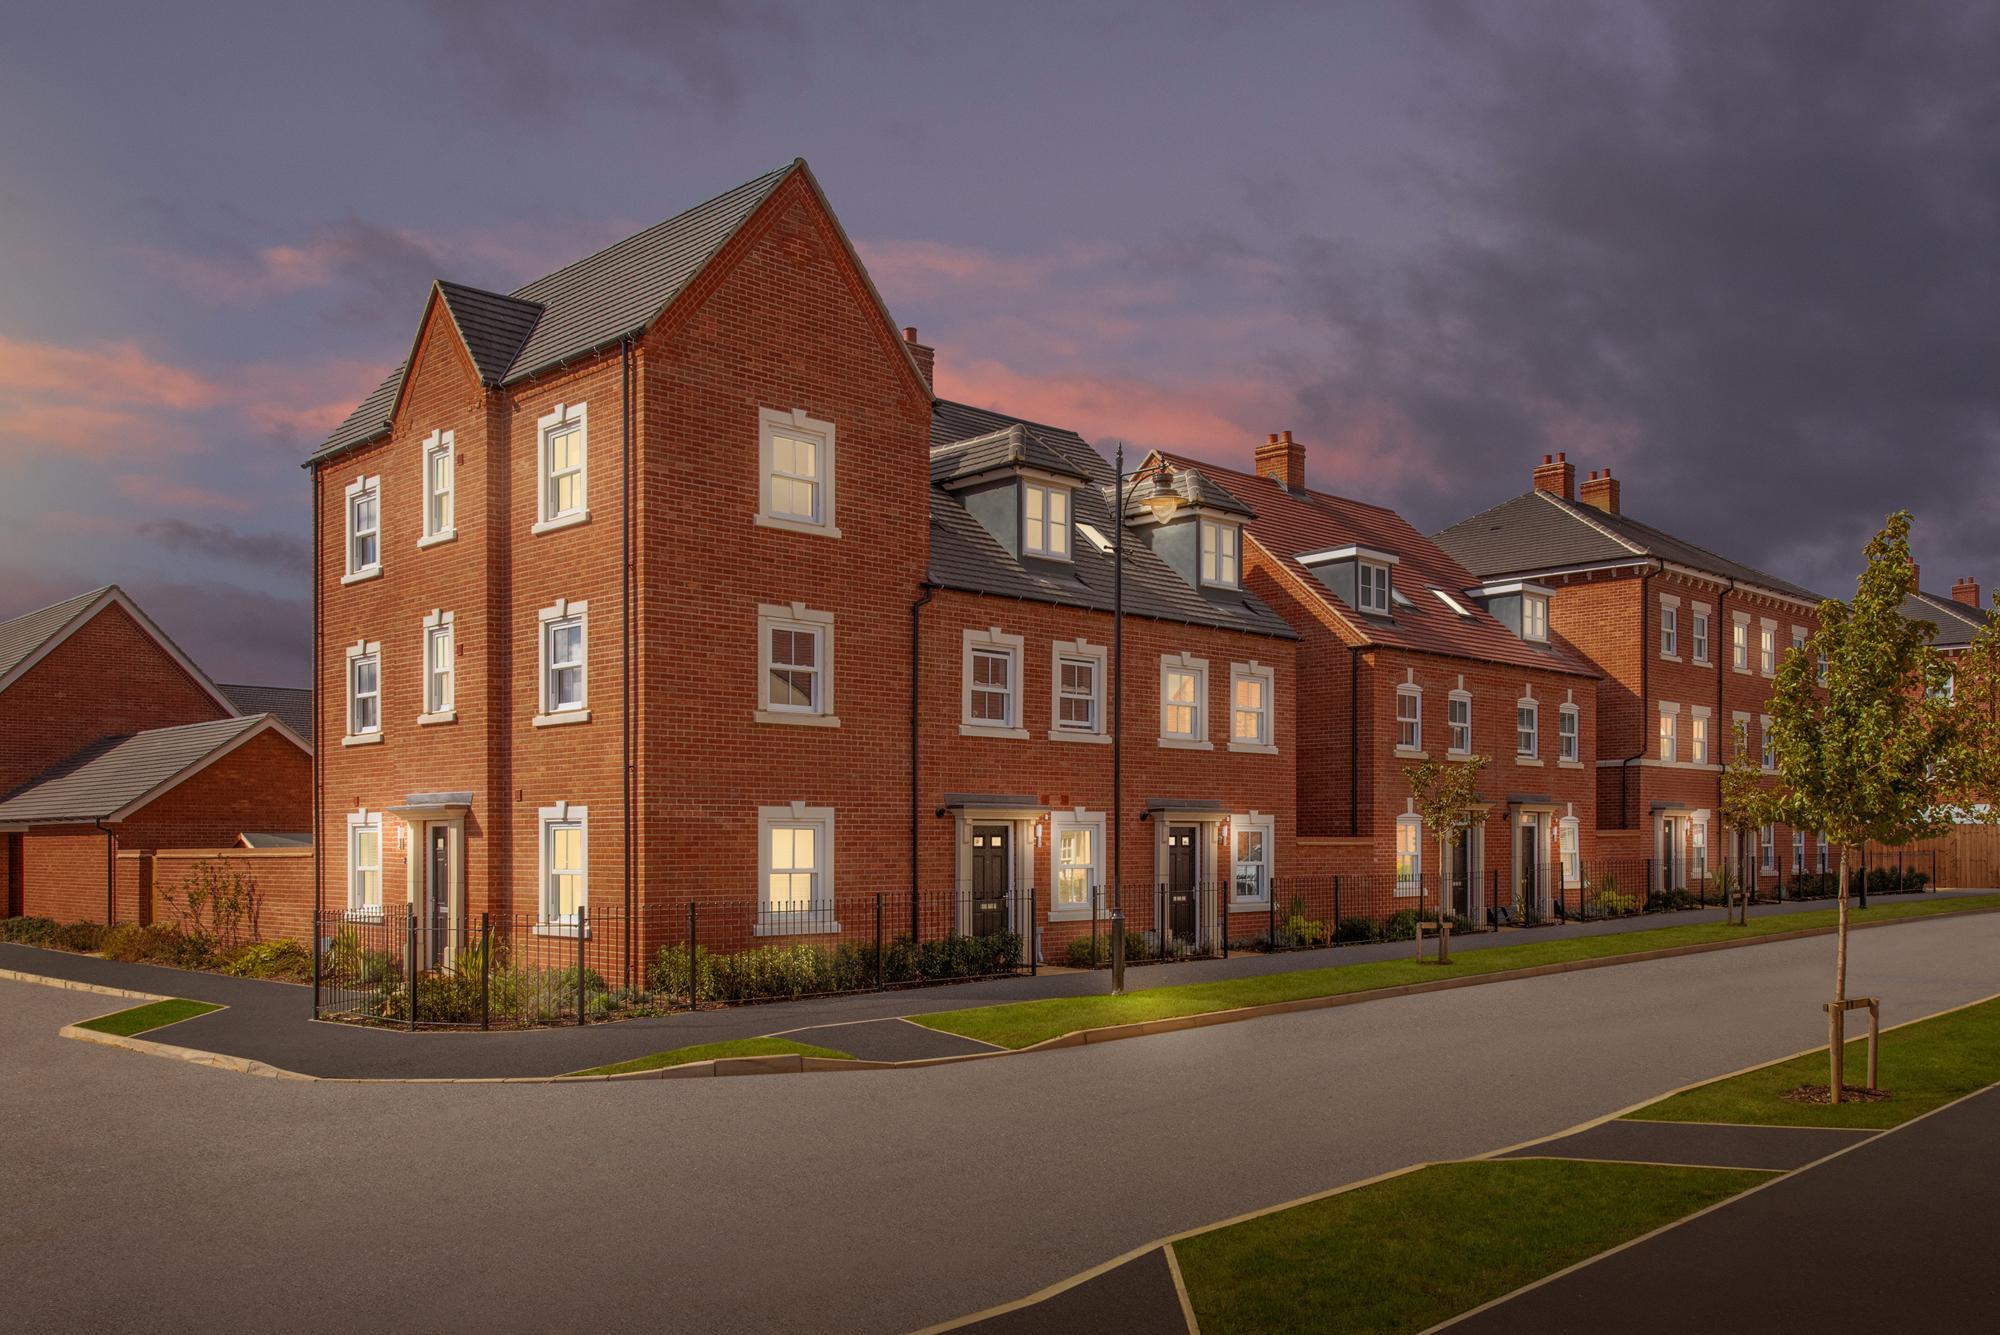 New Build Homes in Biddenham